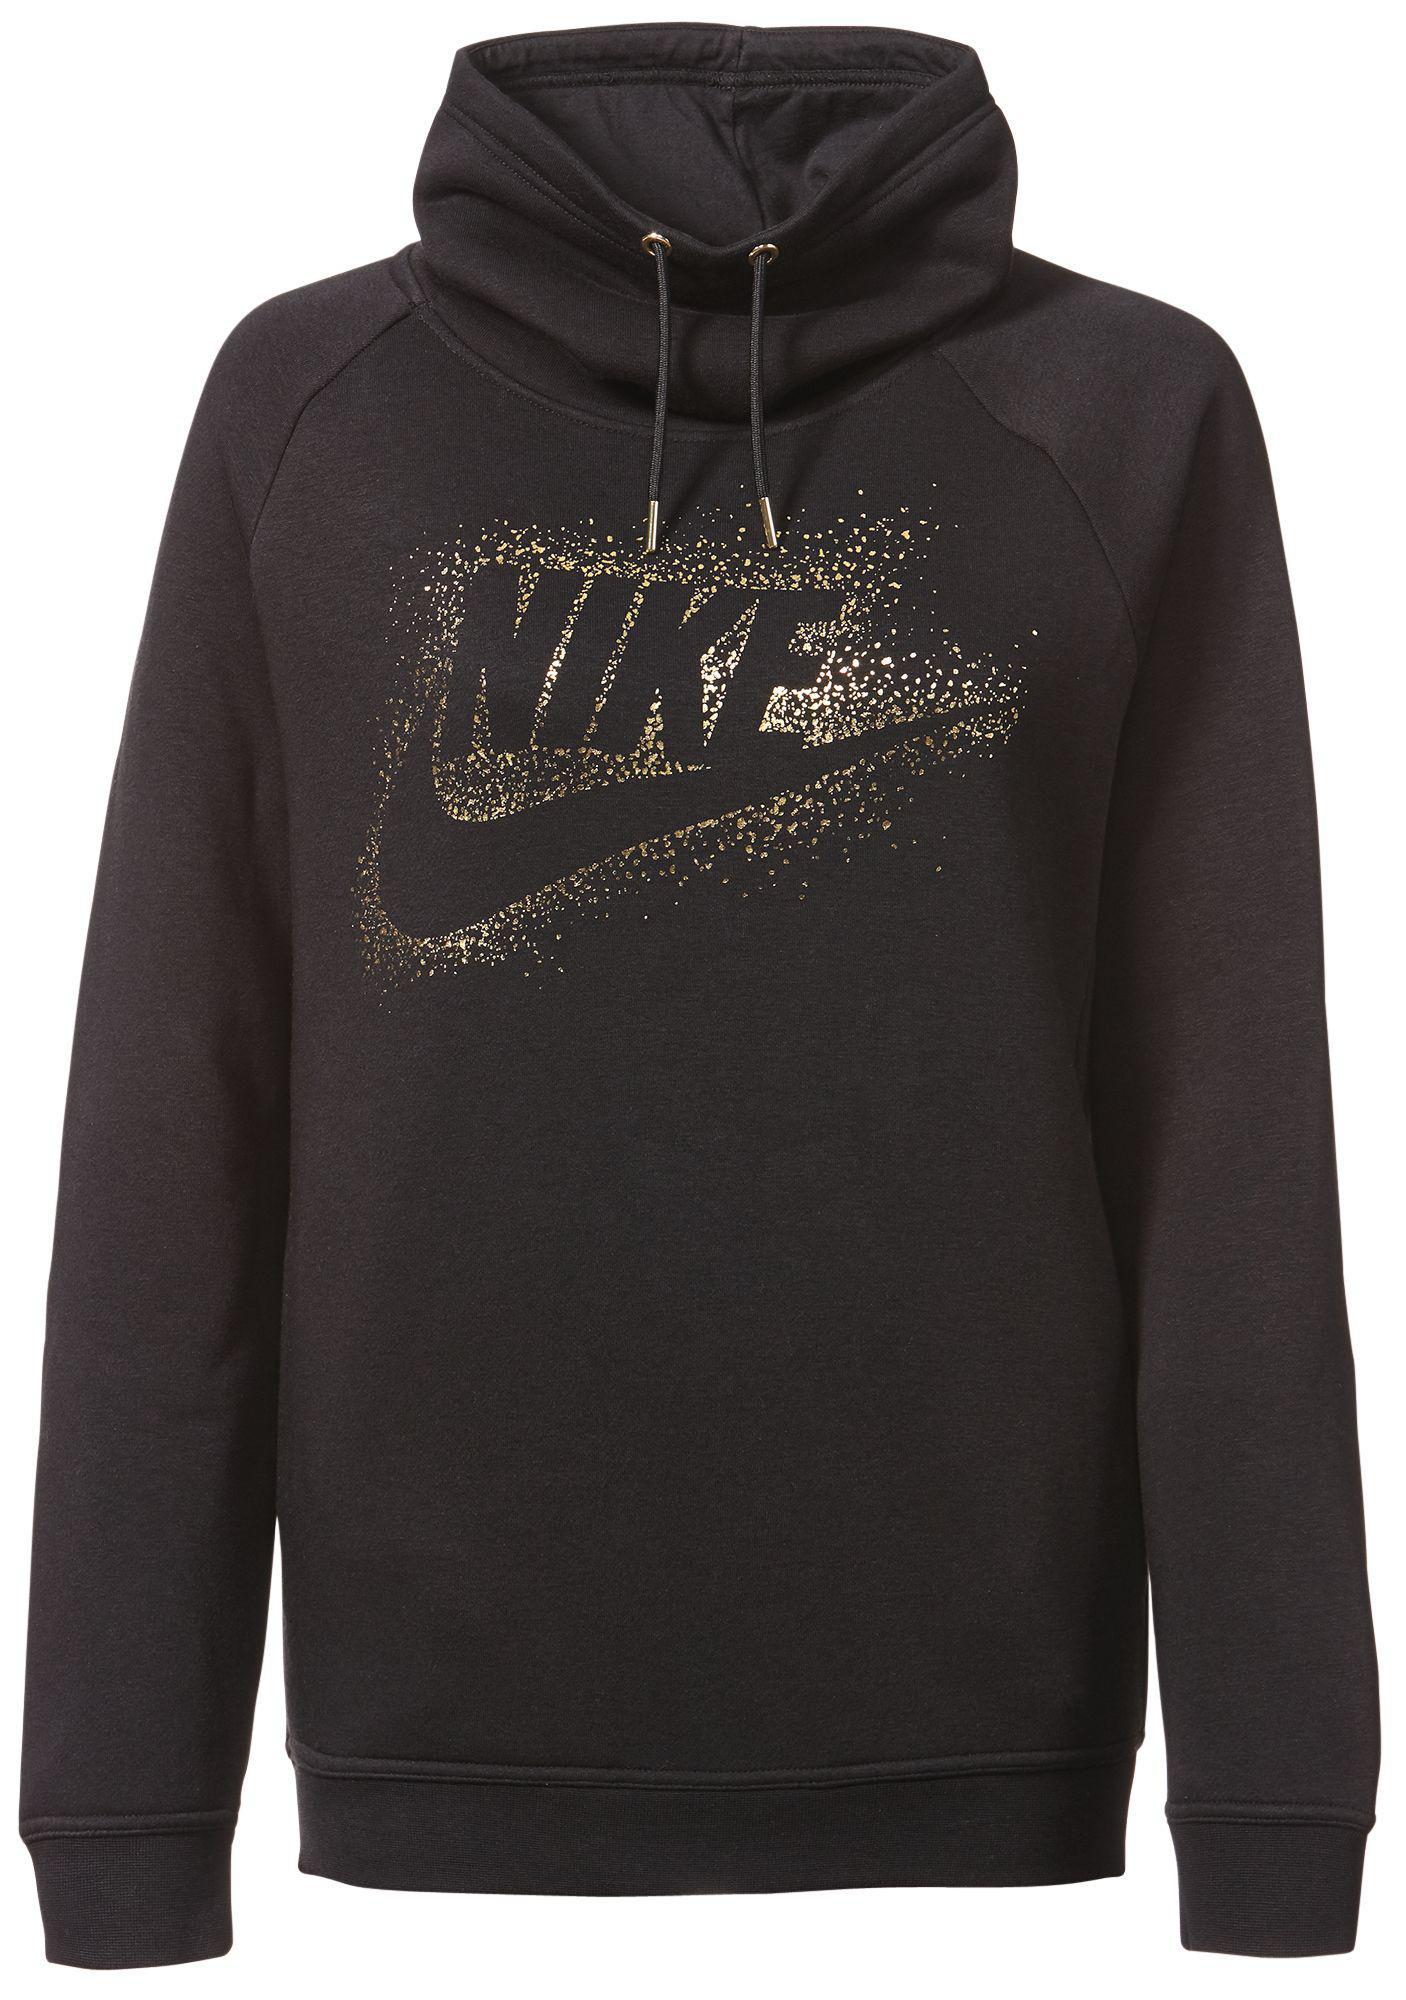 a5e08282e623 Lyst - Nike Sportswear Rally Metallic Funnel Neck Graphic Hoodie in ...